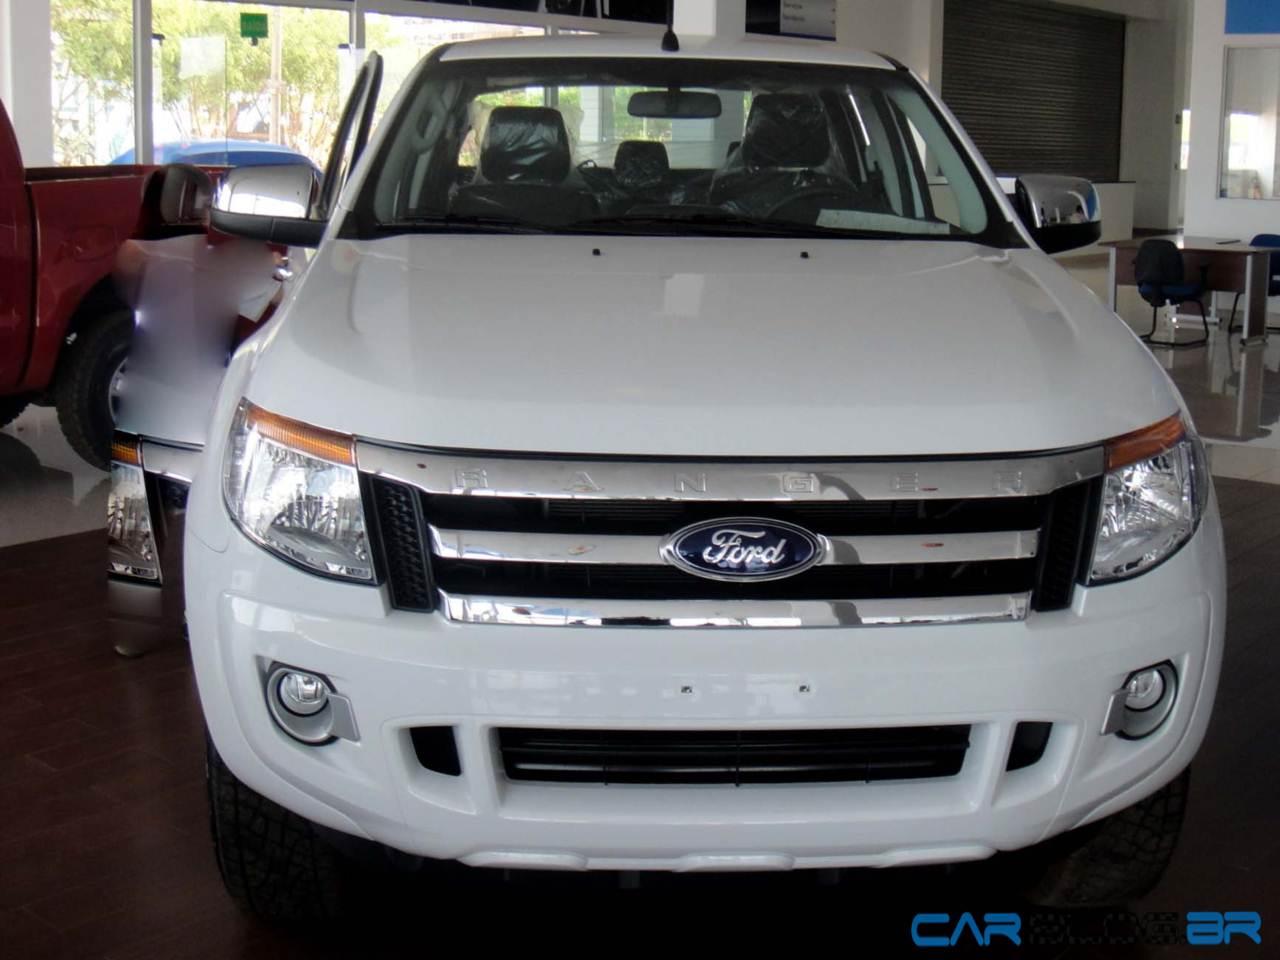 Ford Ranger XLT 2.5 Flex: 6,2 Km/l de álcool